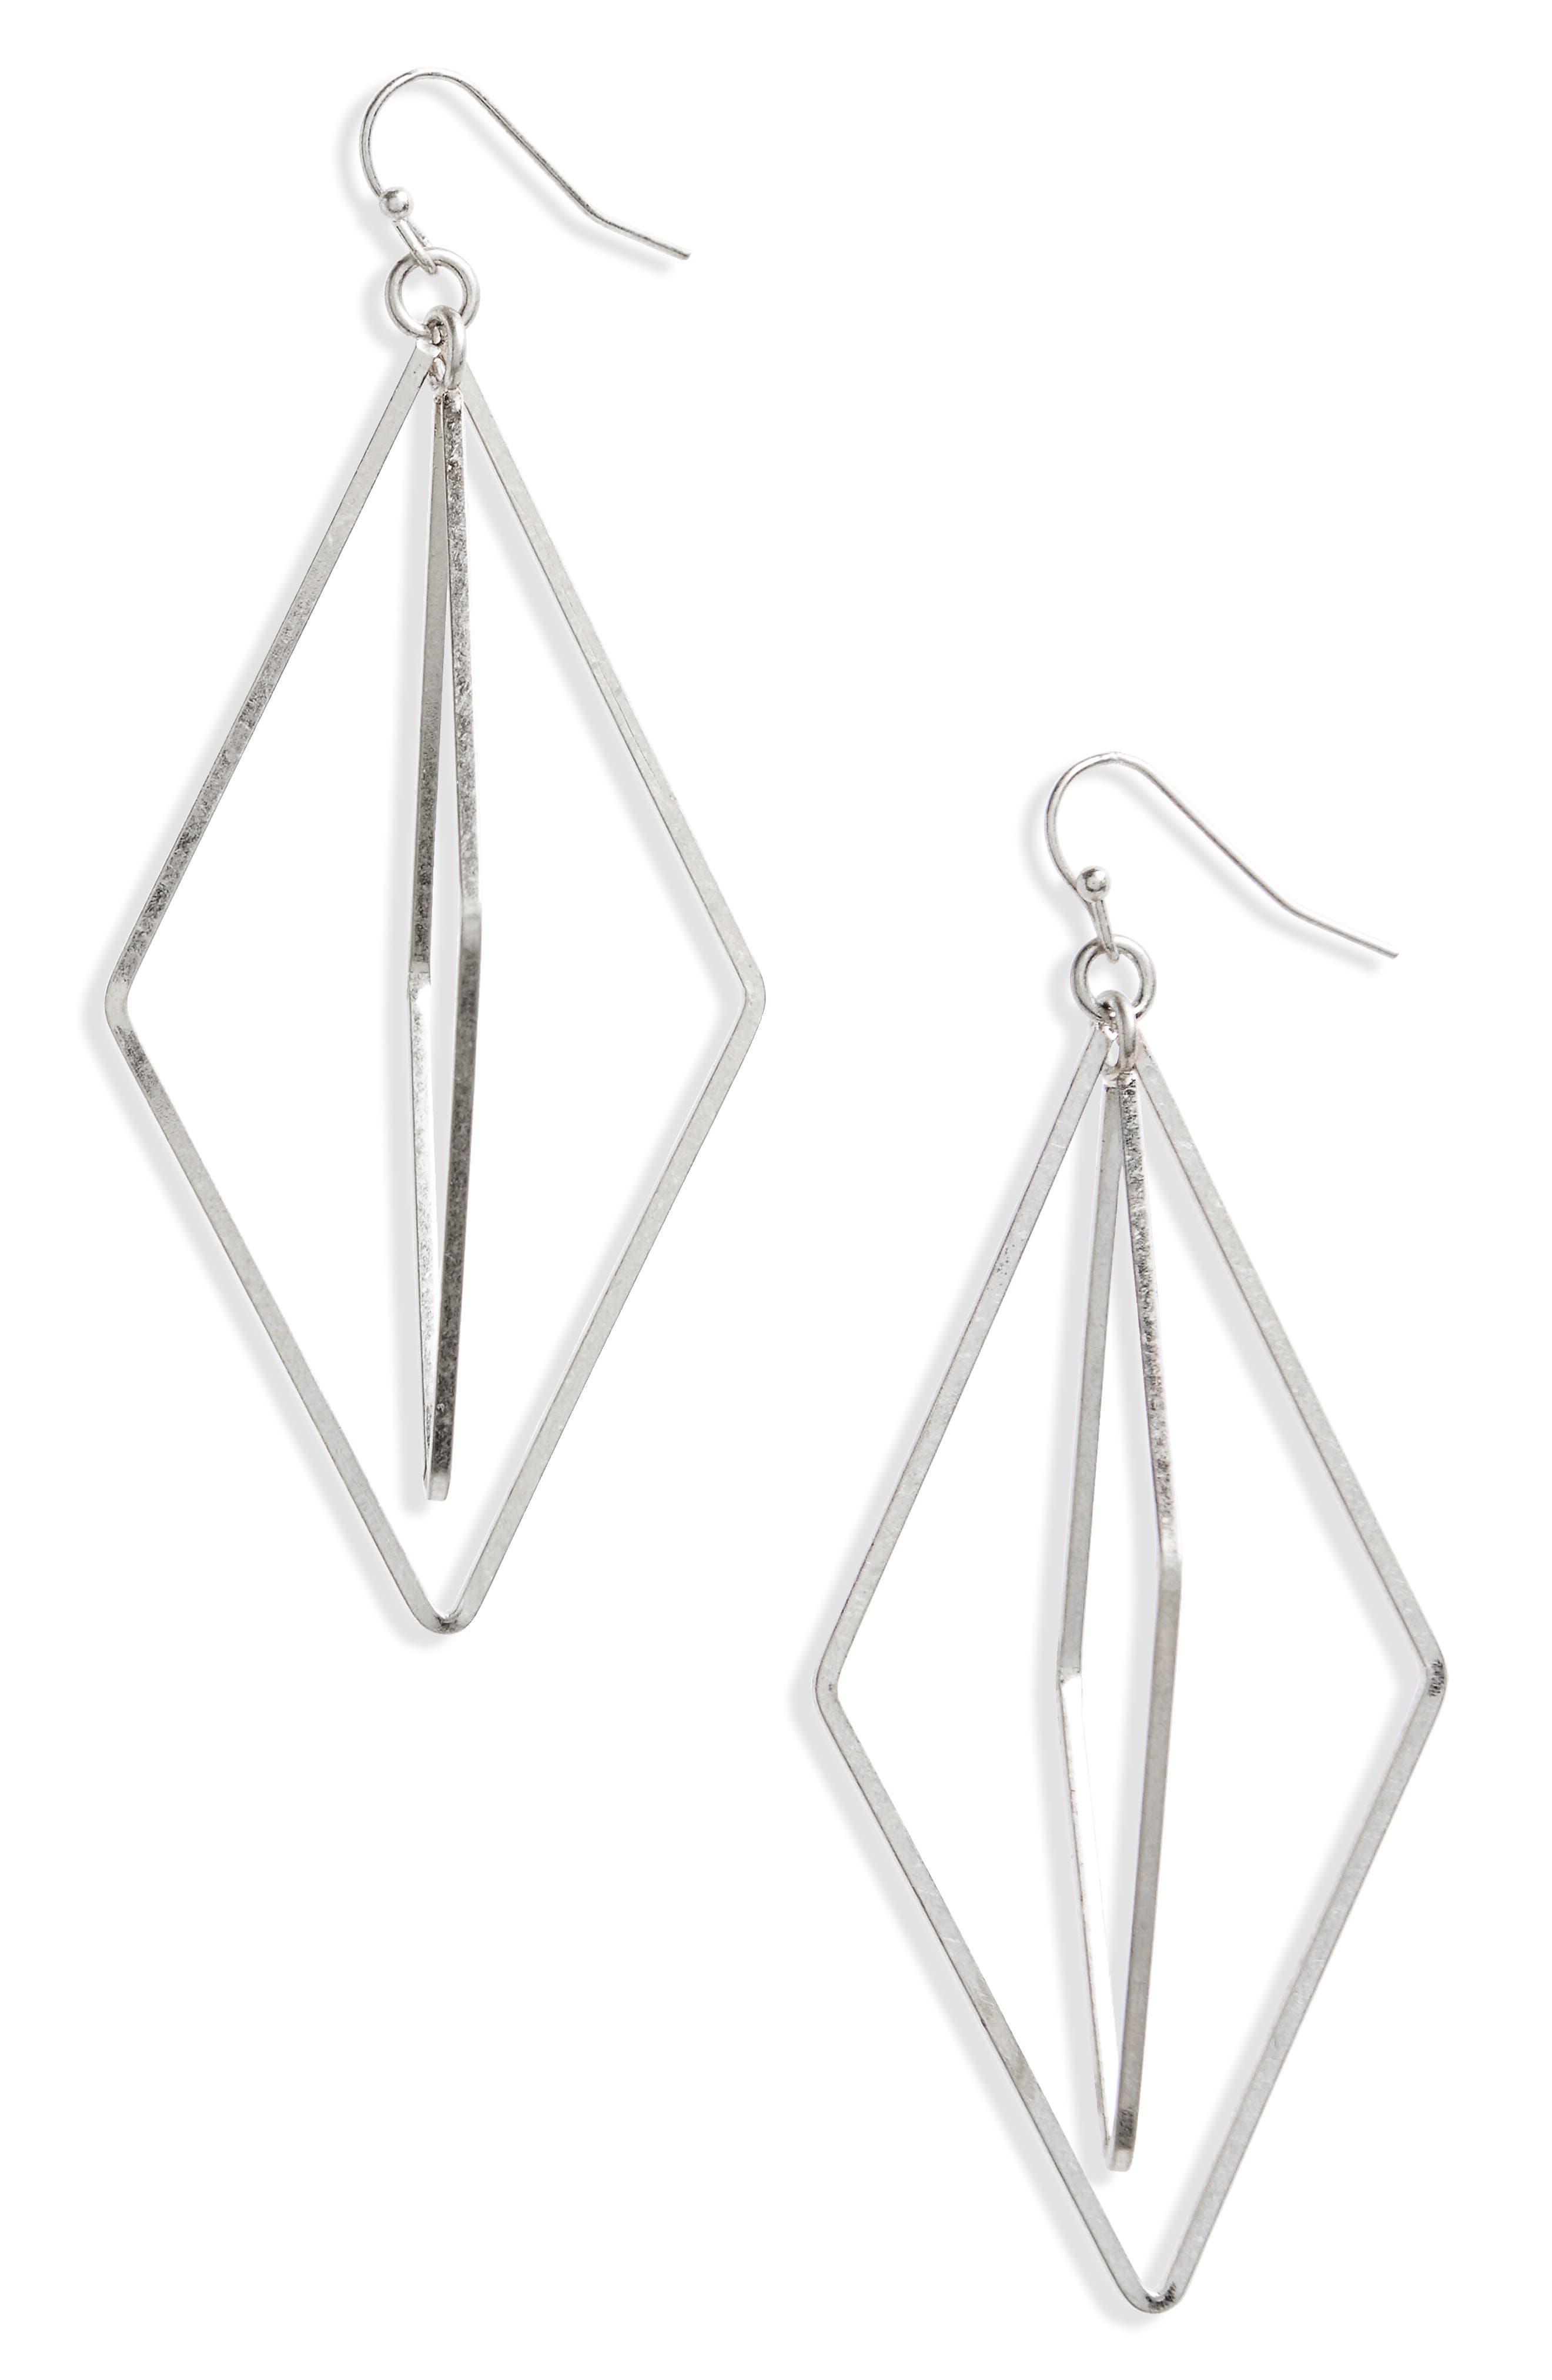 Orbital Geo Earrings,                             Main thumbnail 1, color,                             Silver